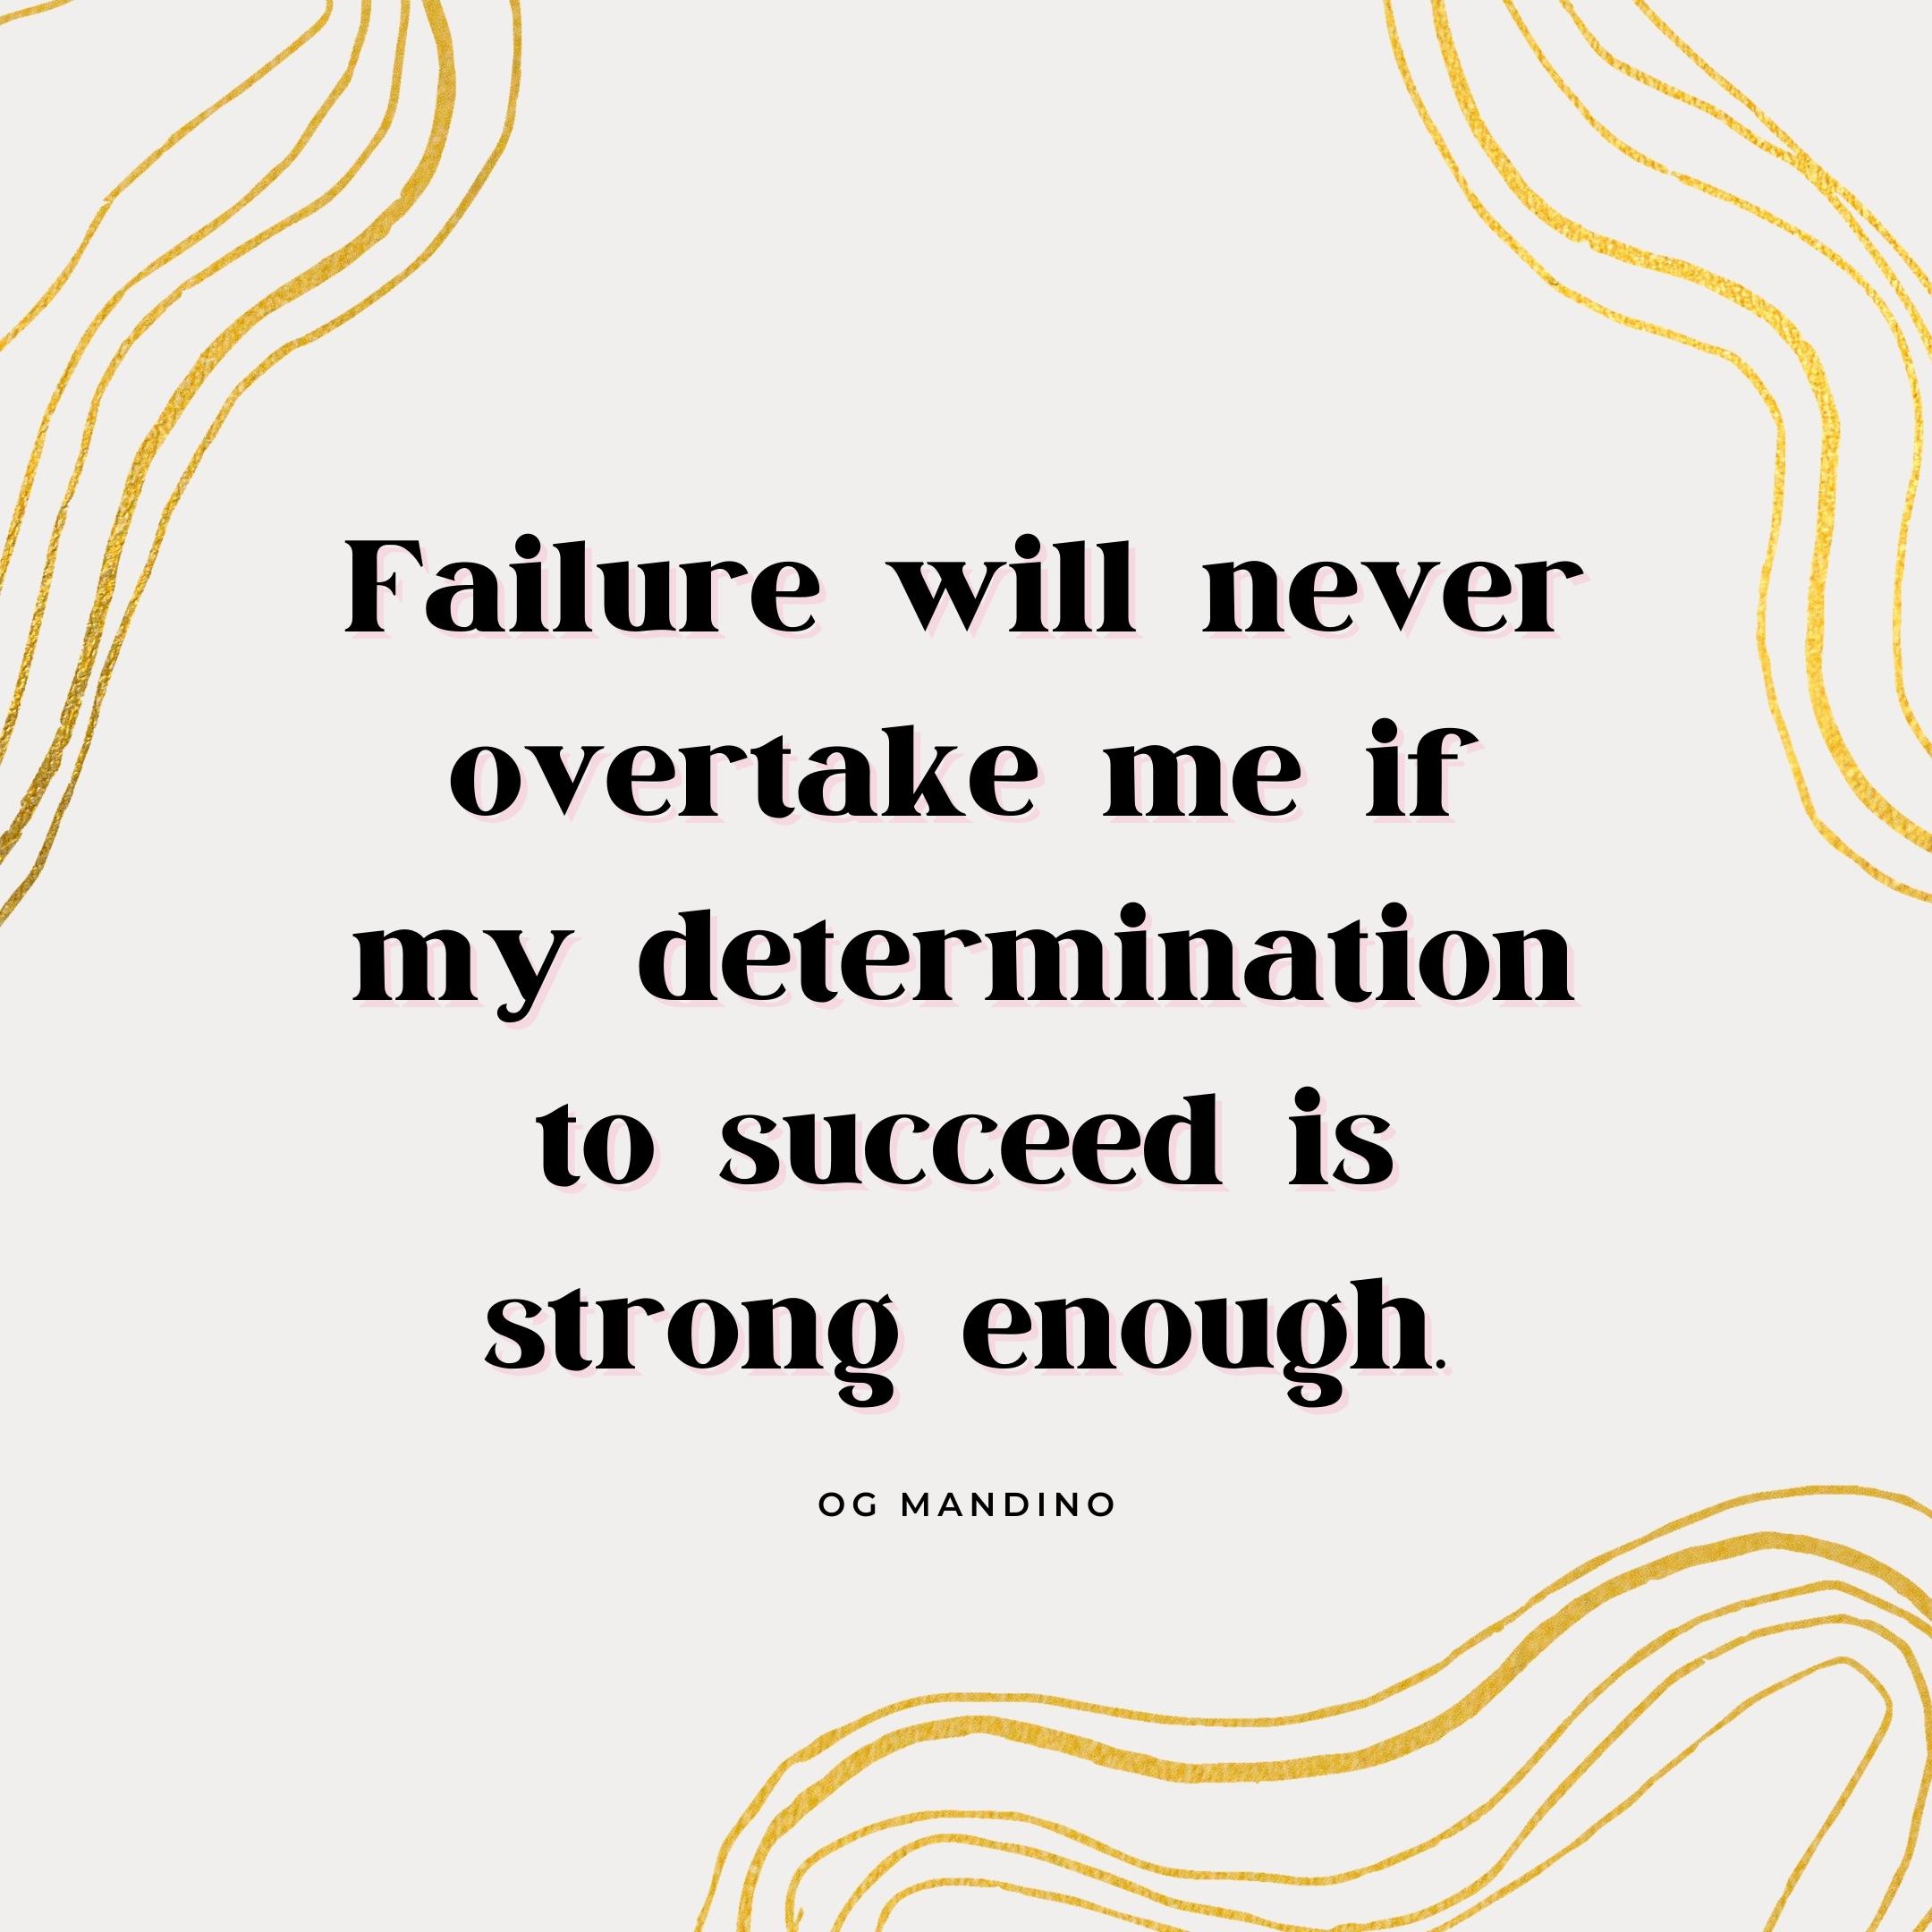 og mandino quote | monday motivation quotes